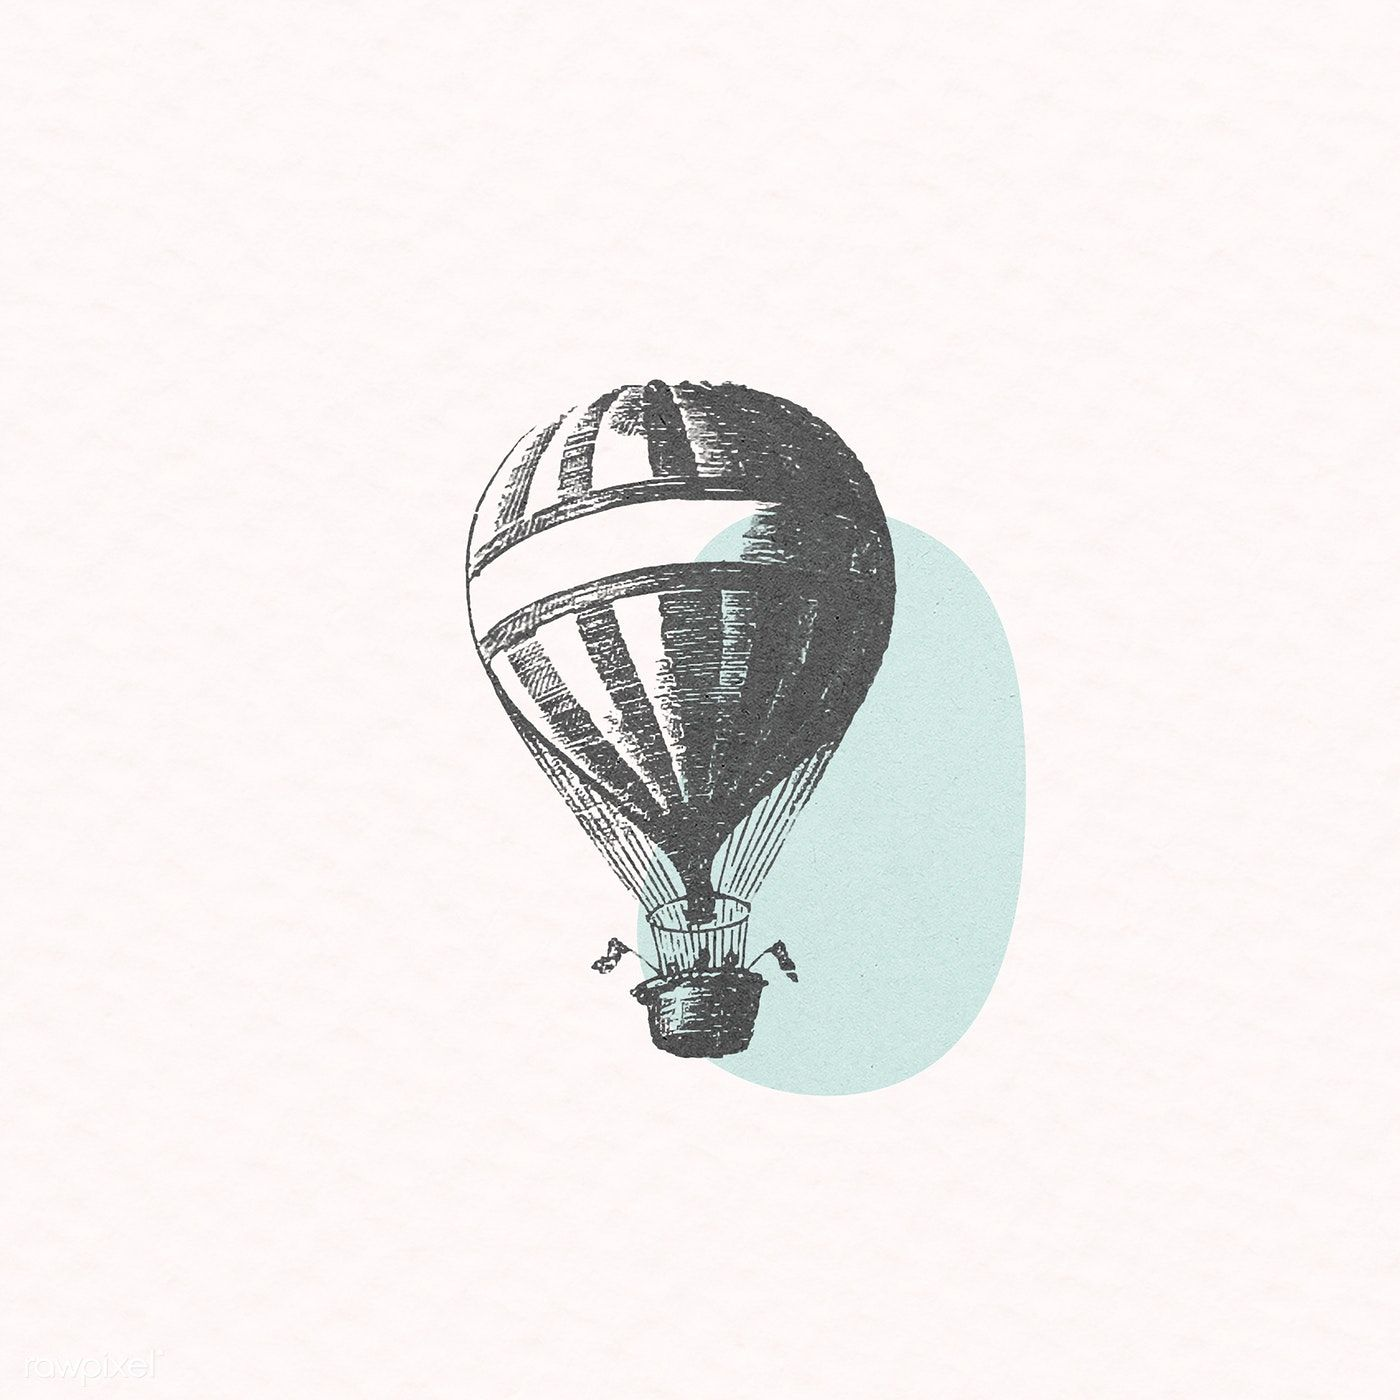 Download Premium Illustration Of Vintage Hot Air Balloon Illustration